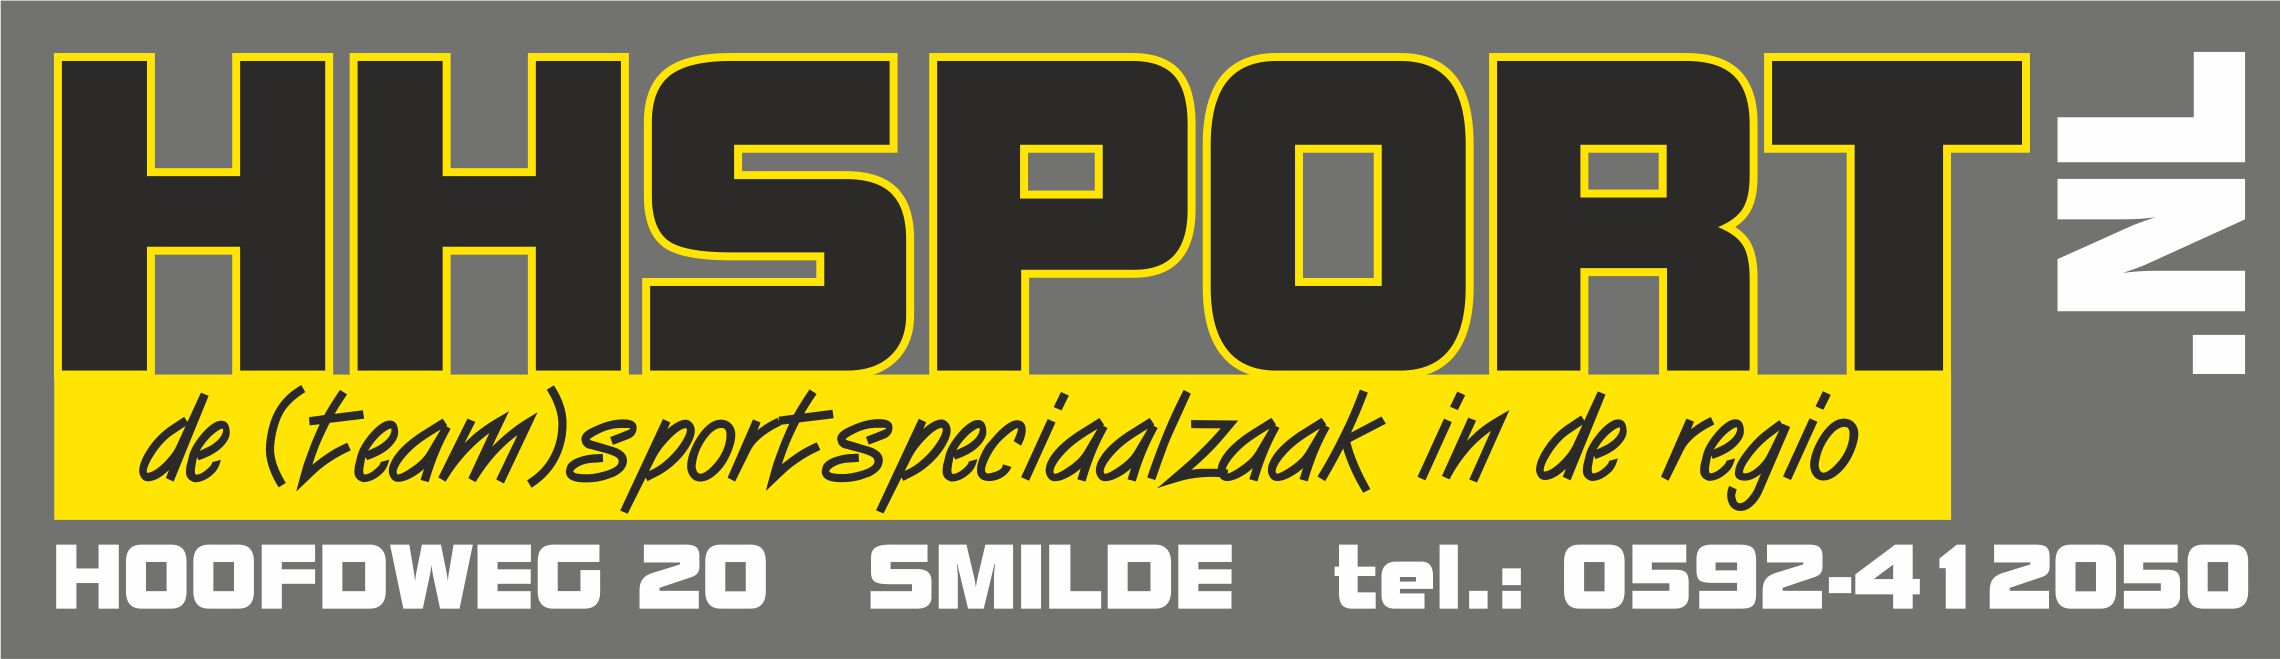 logo HHSPORT 2014